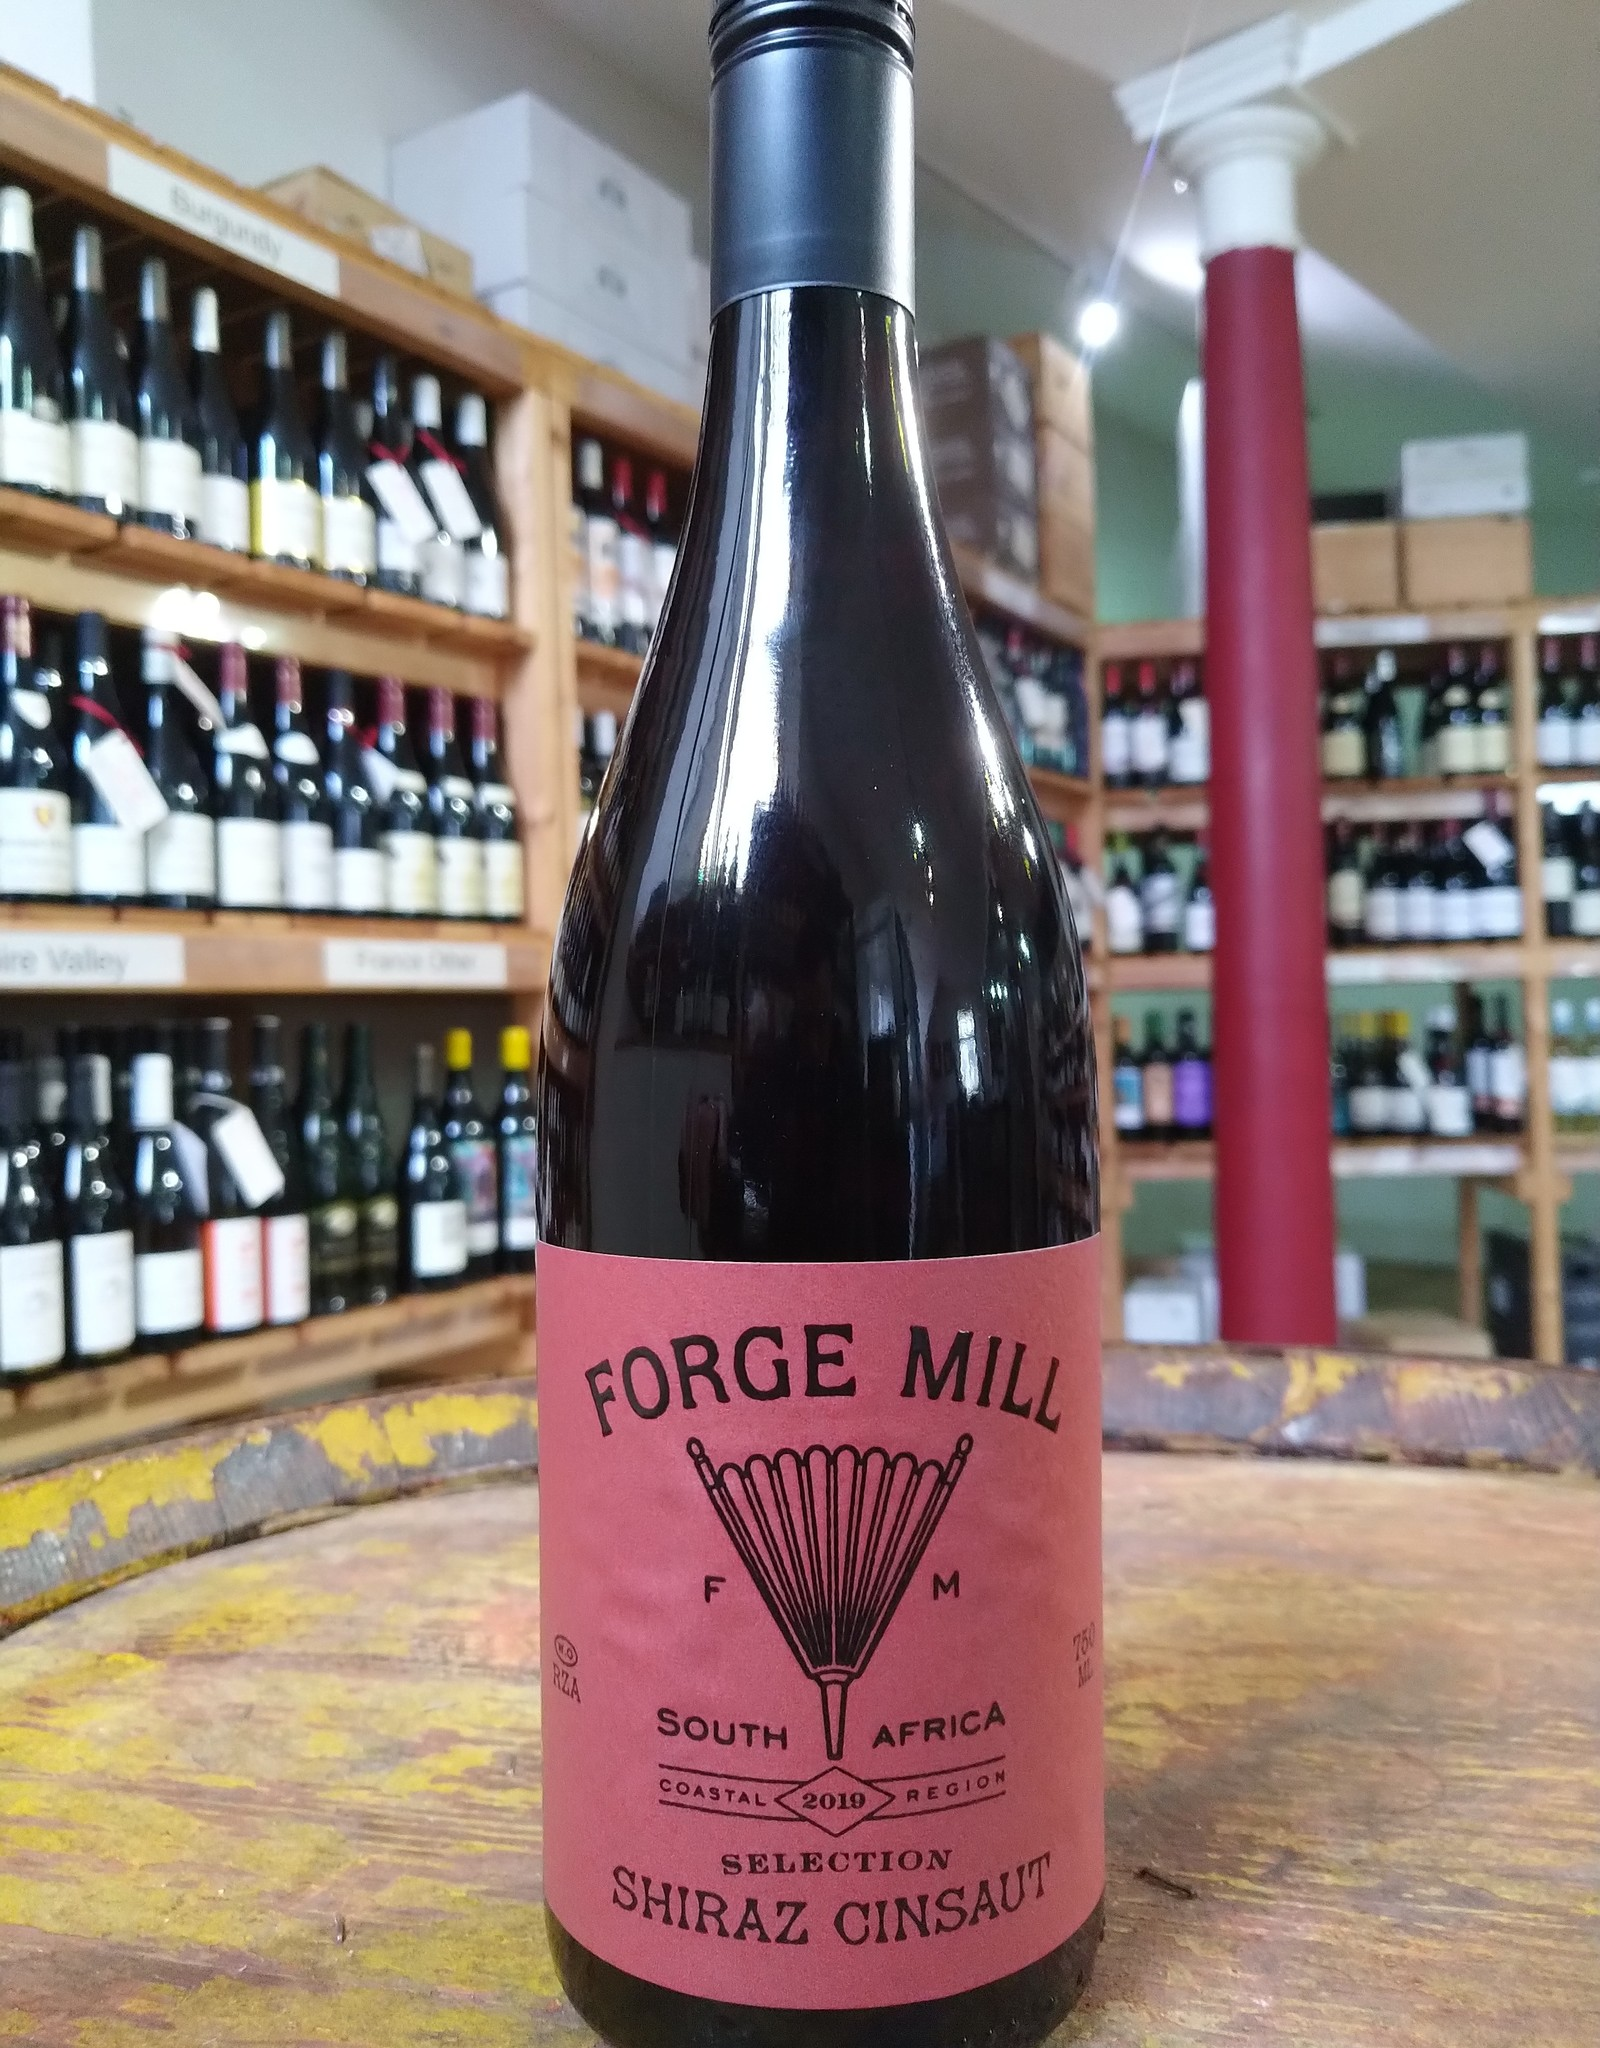 2019 Forge Mill Shiraz/Cinsaut